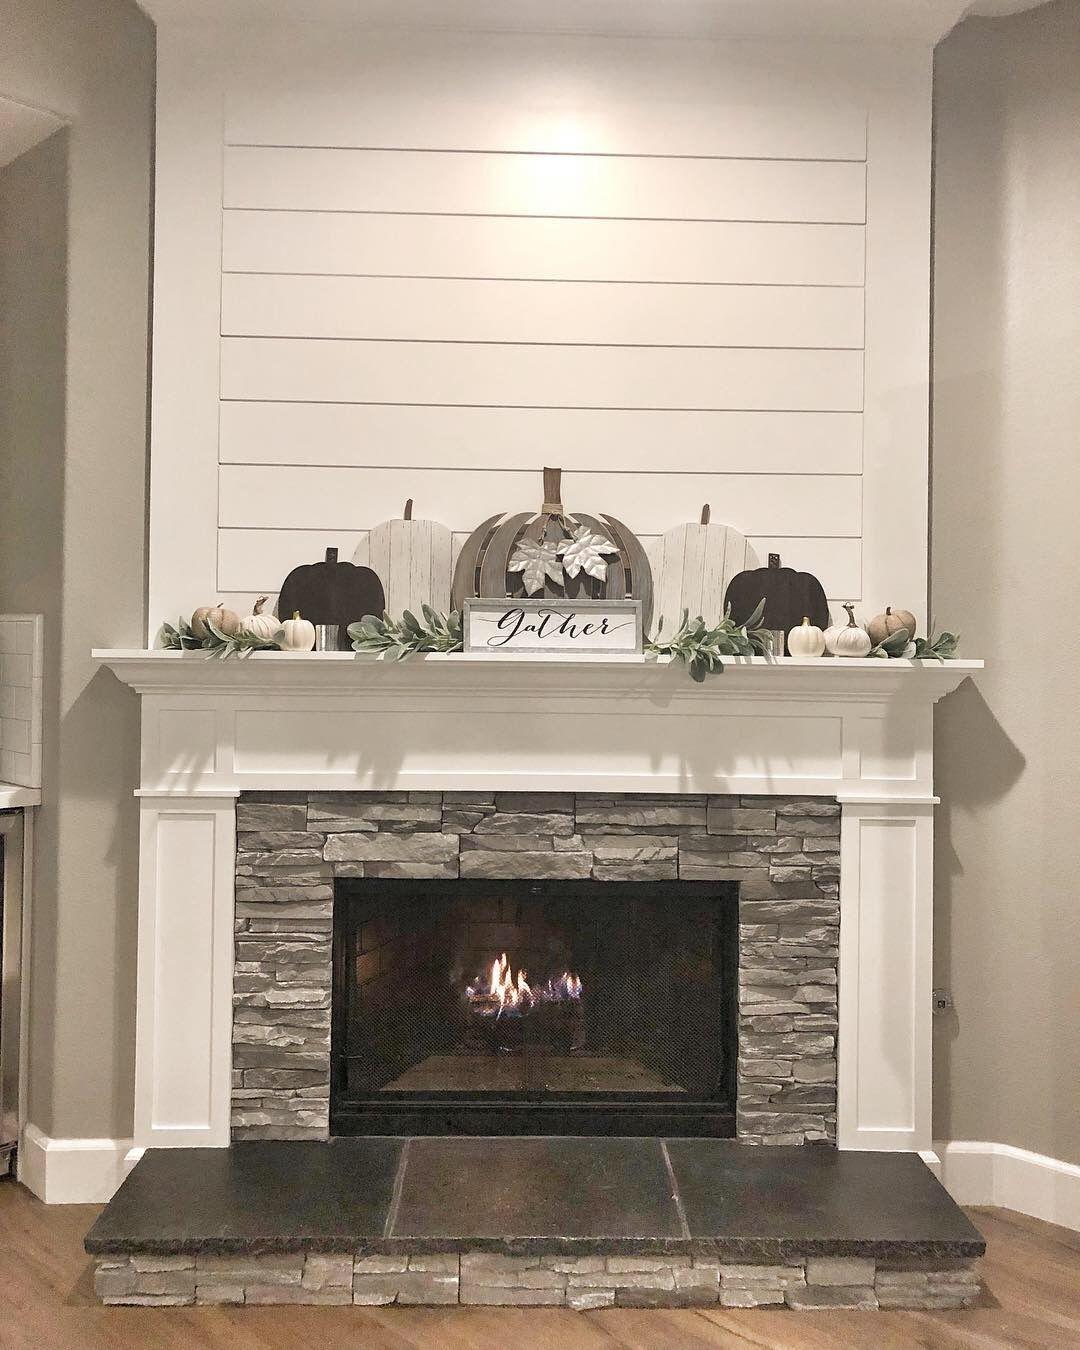 Shiplap Fireplace – Living Room Renovation Part 1